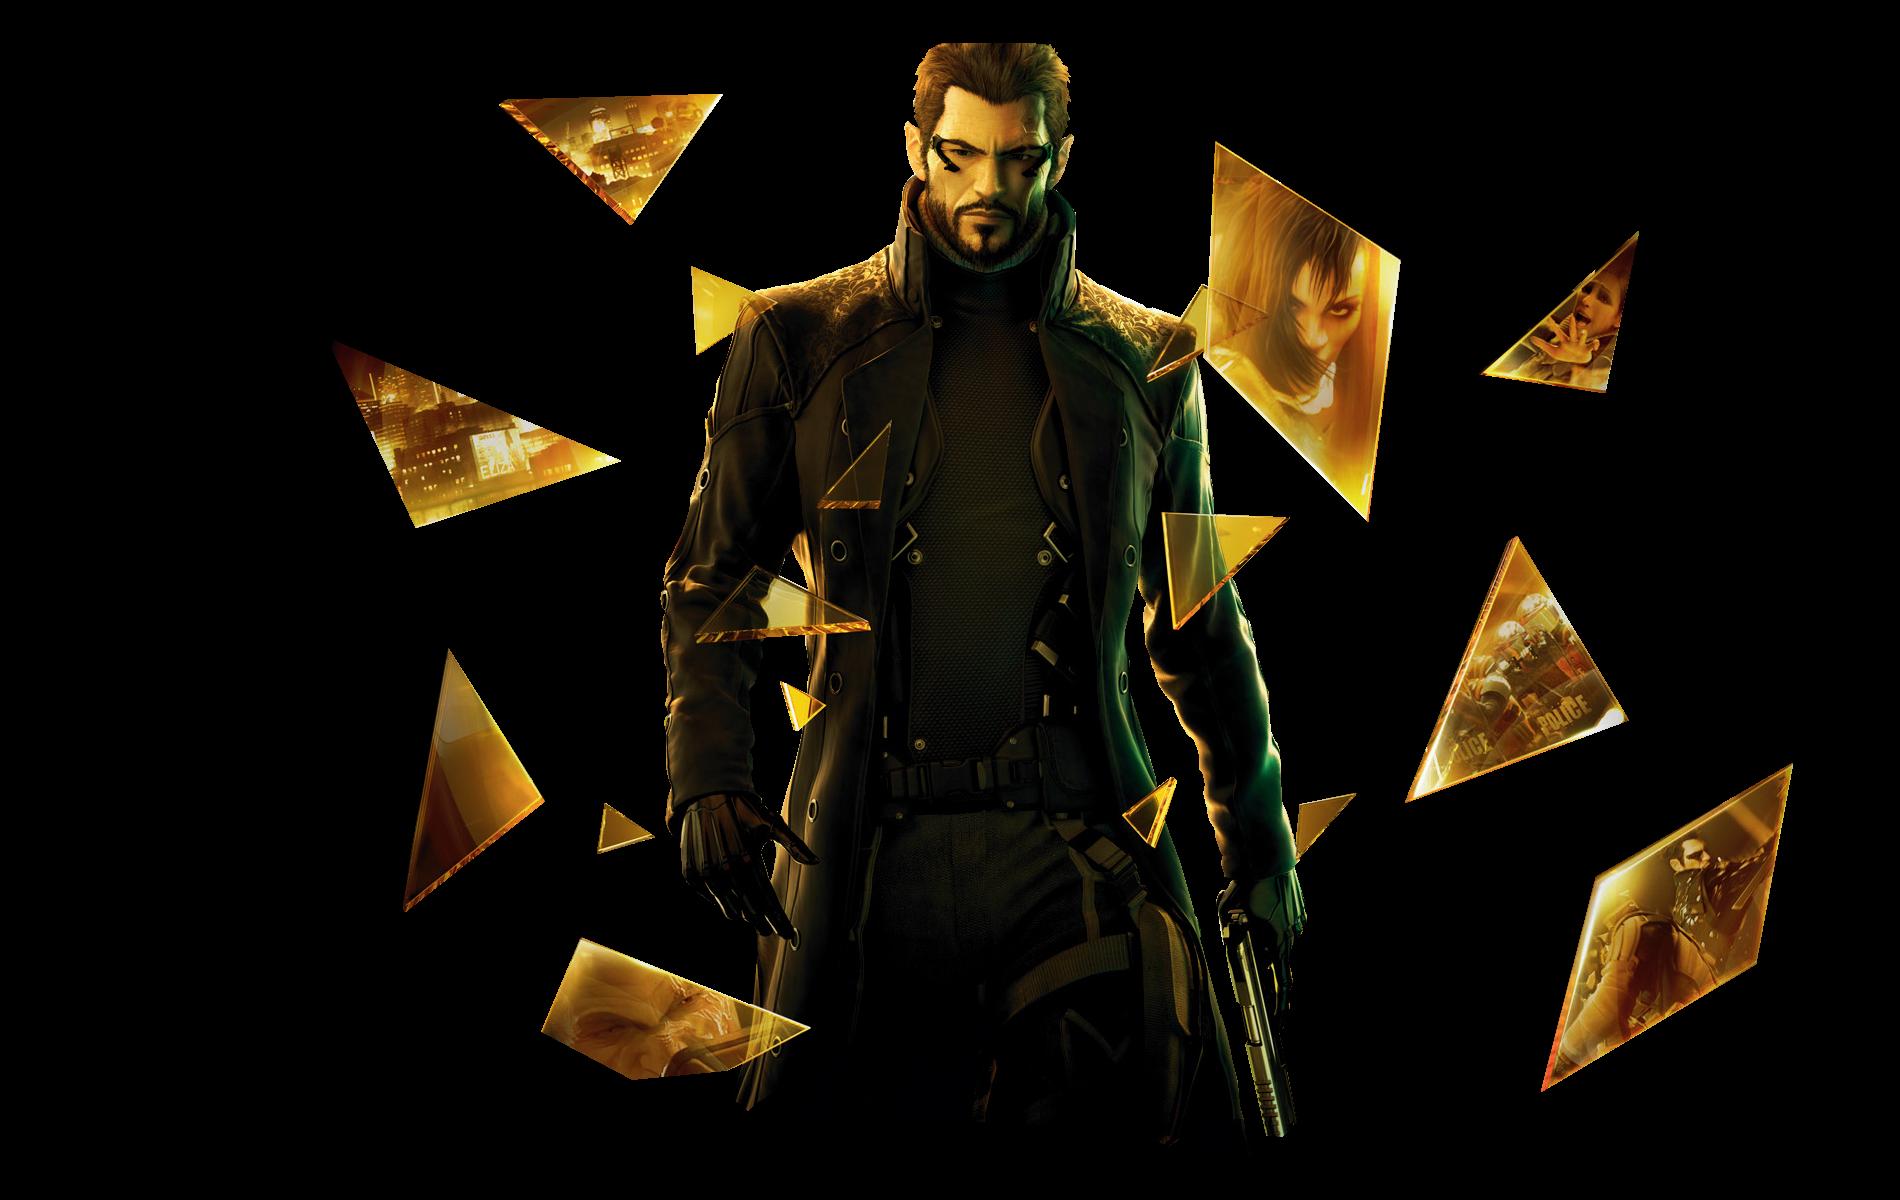 Deus Ex HD PNG